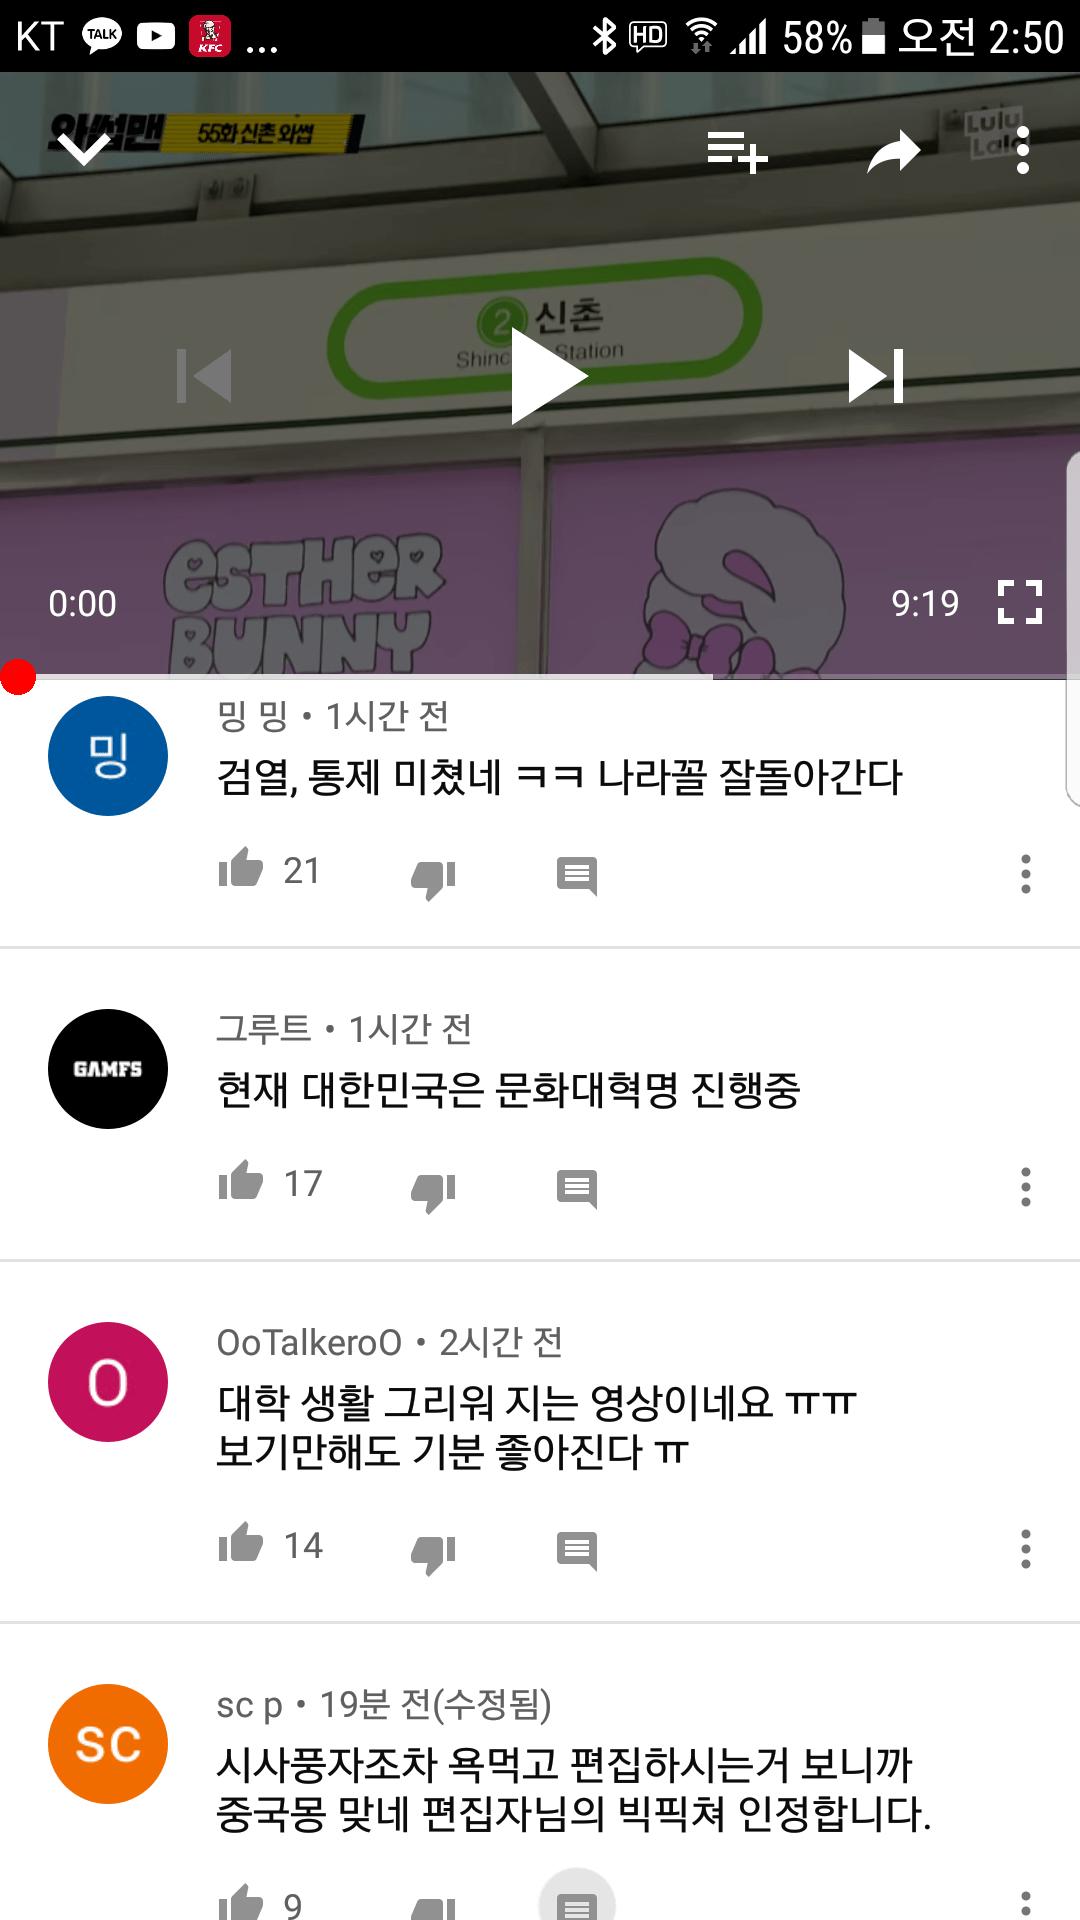 Screenshot_20190316-025003.png 와썹맨 편집수정 댓글현황